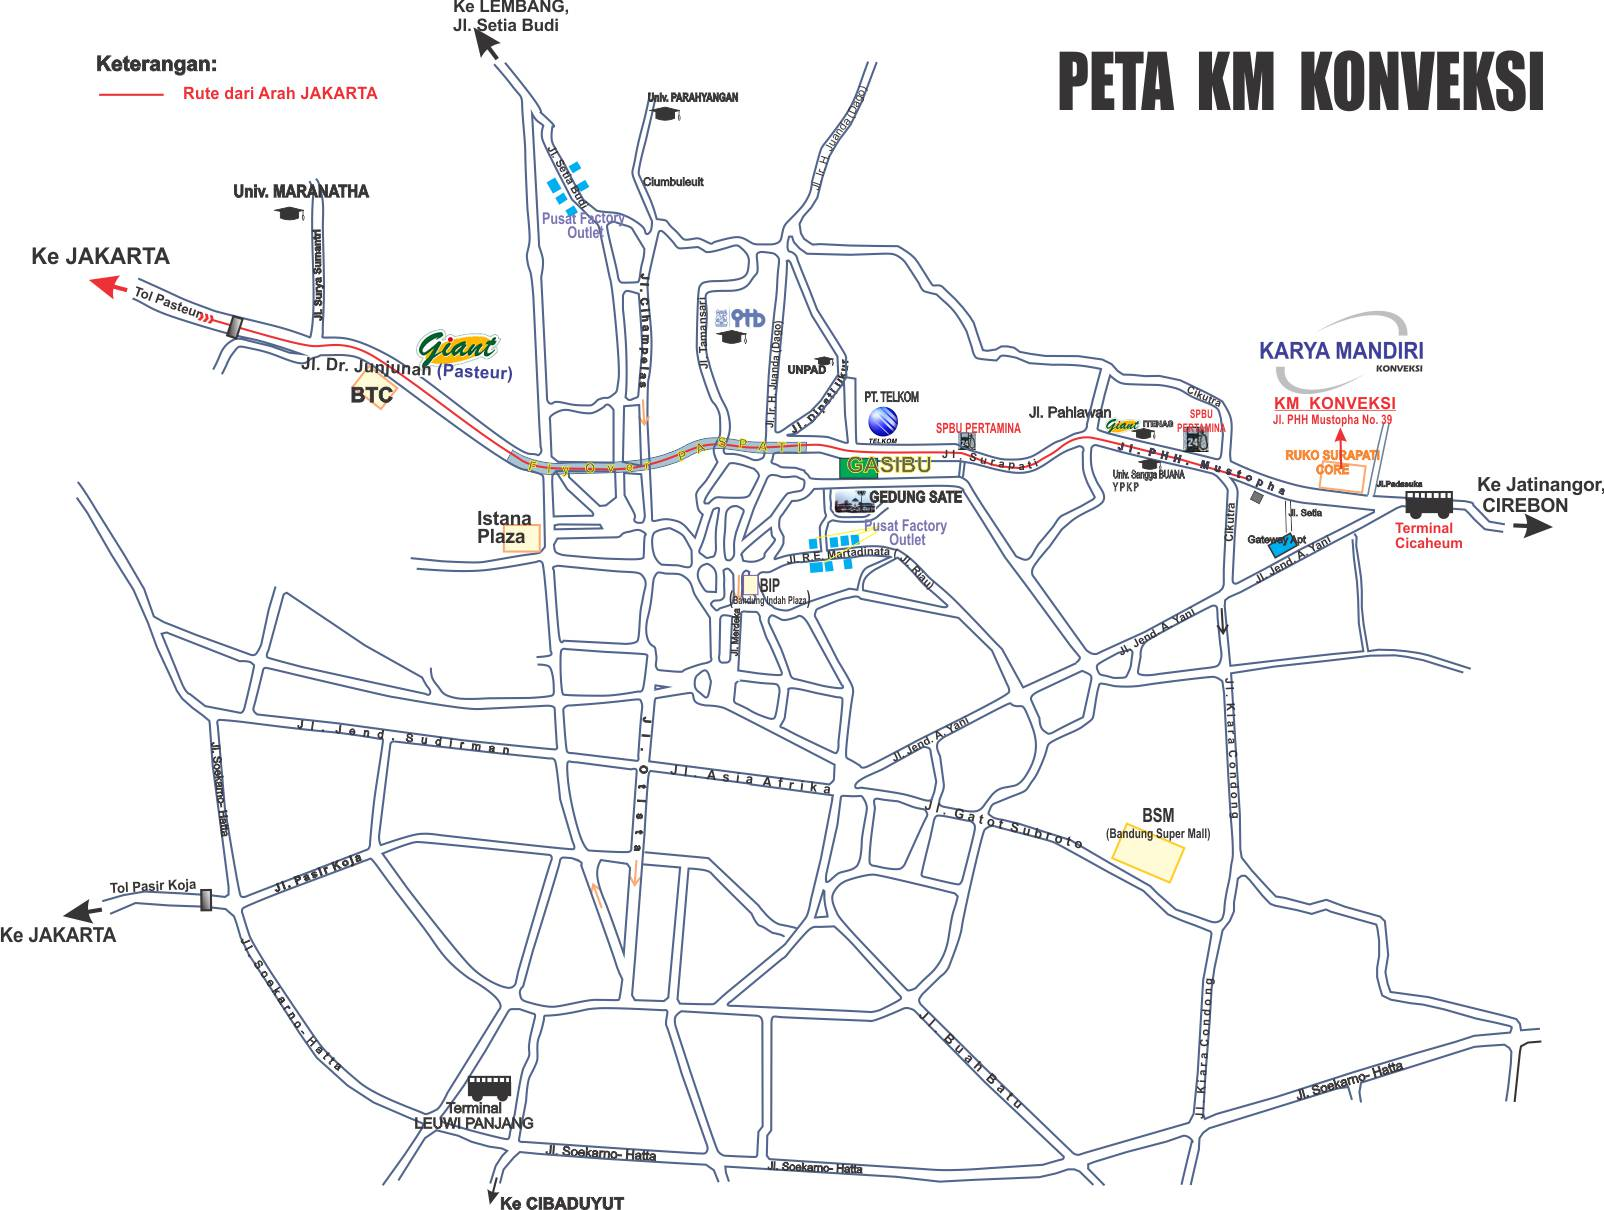 Alamat KM Konveksi Bandung